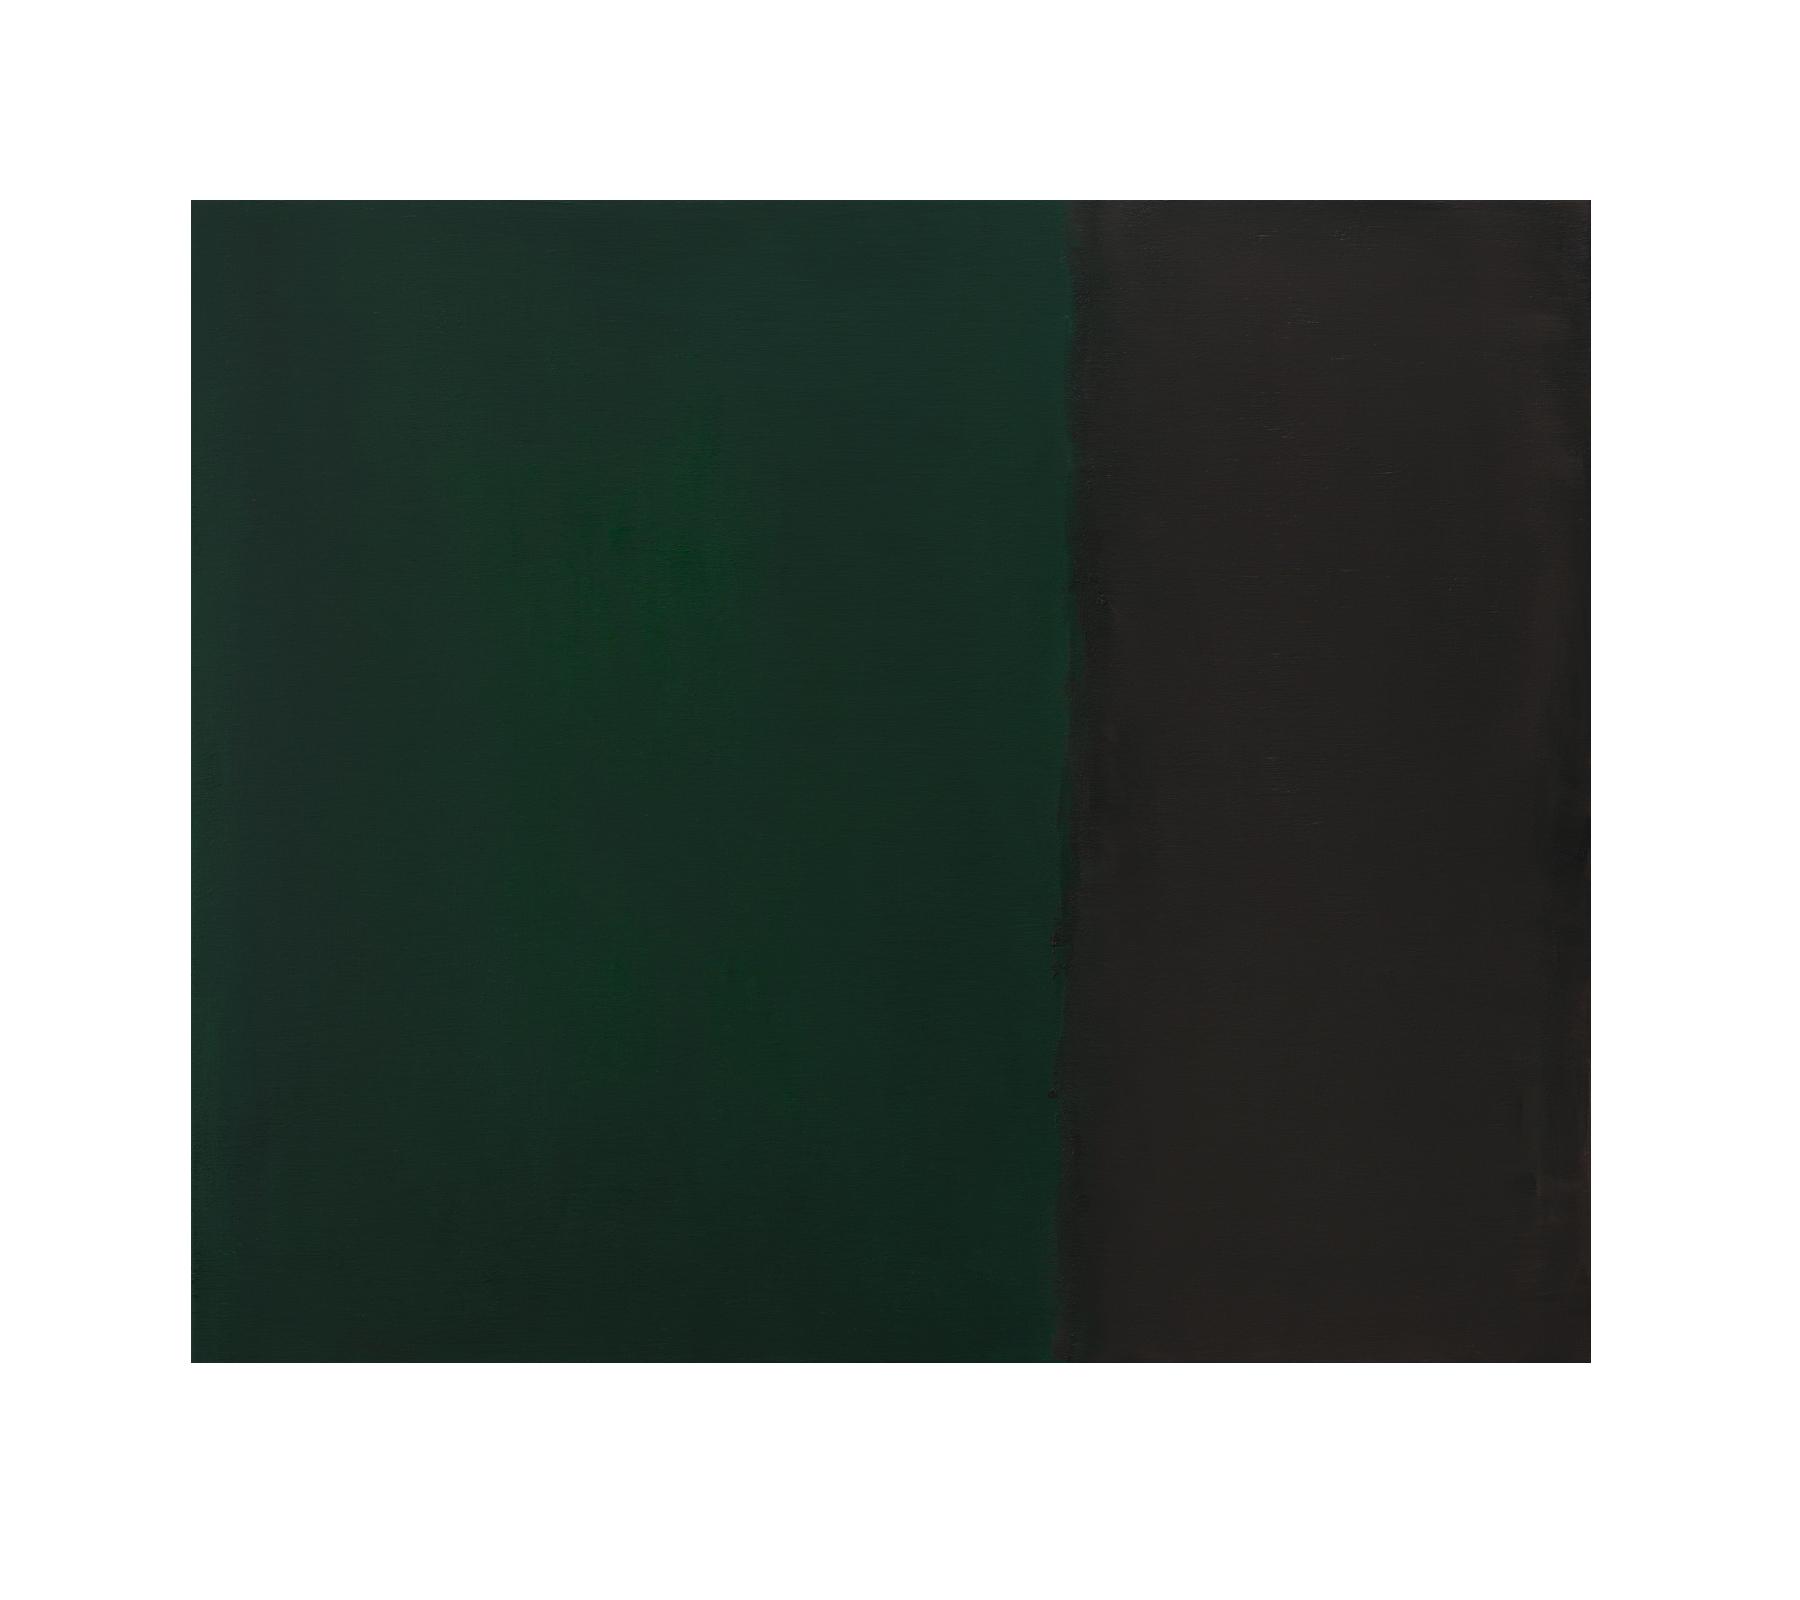 Untitled 2018 100x120cm